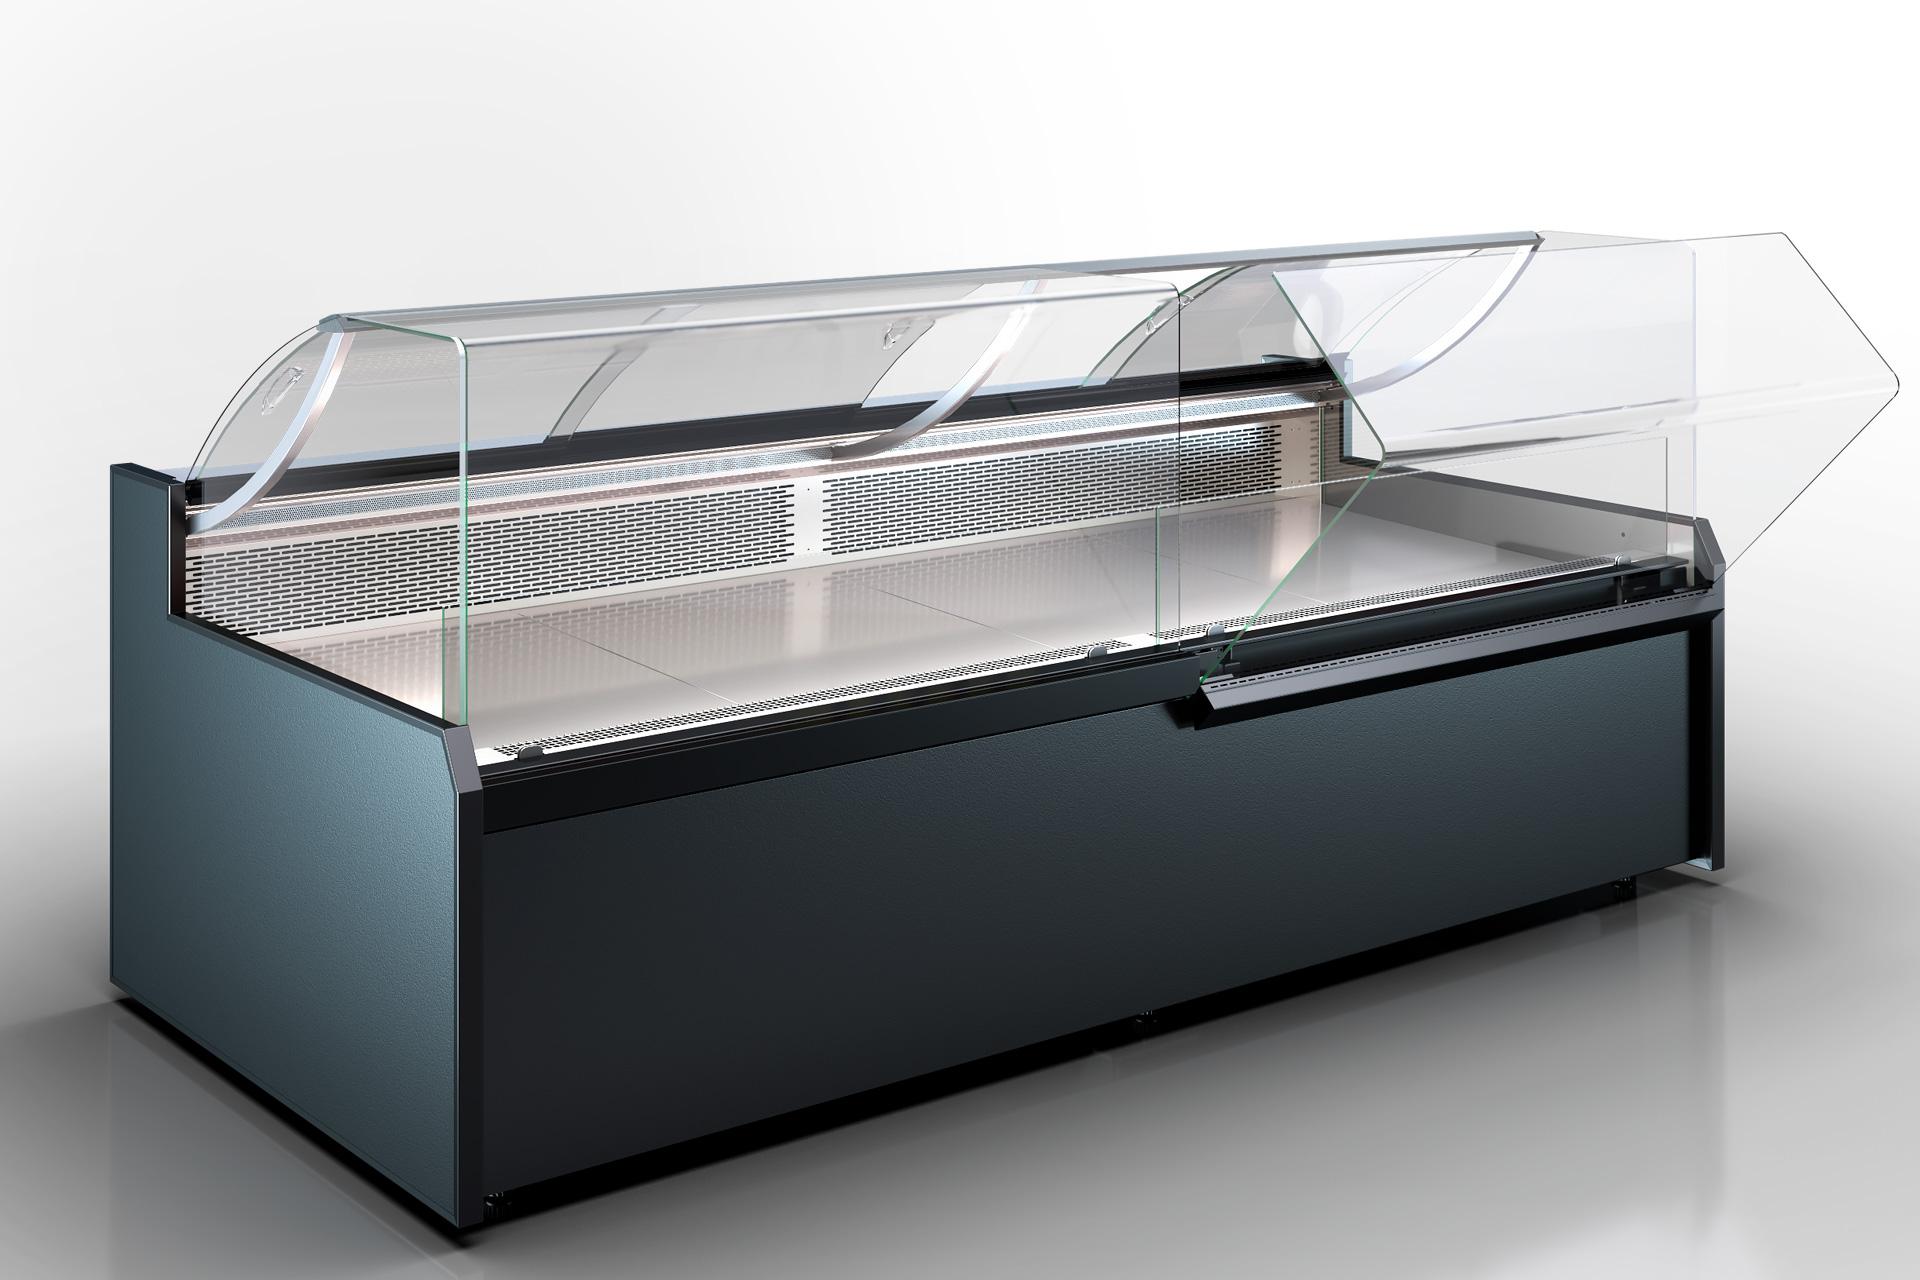 Refrigerated counters Missouri MC 120 deli OS 120-DBM (option)